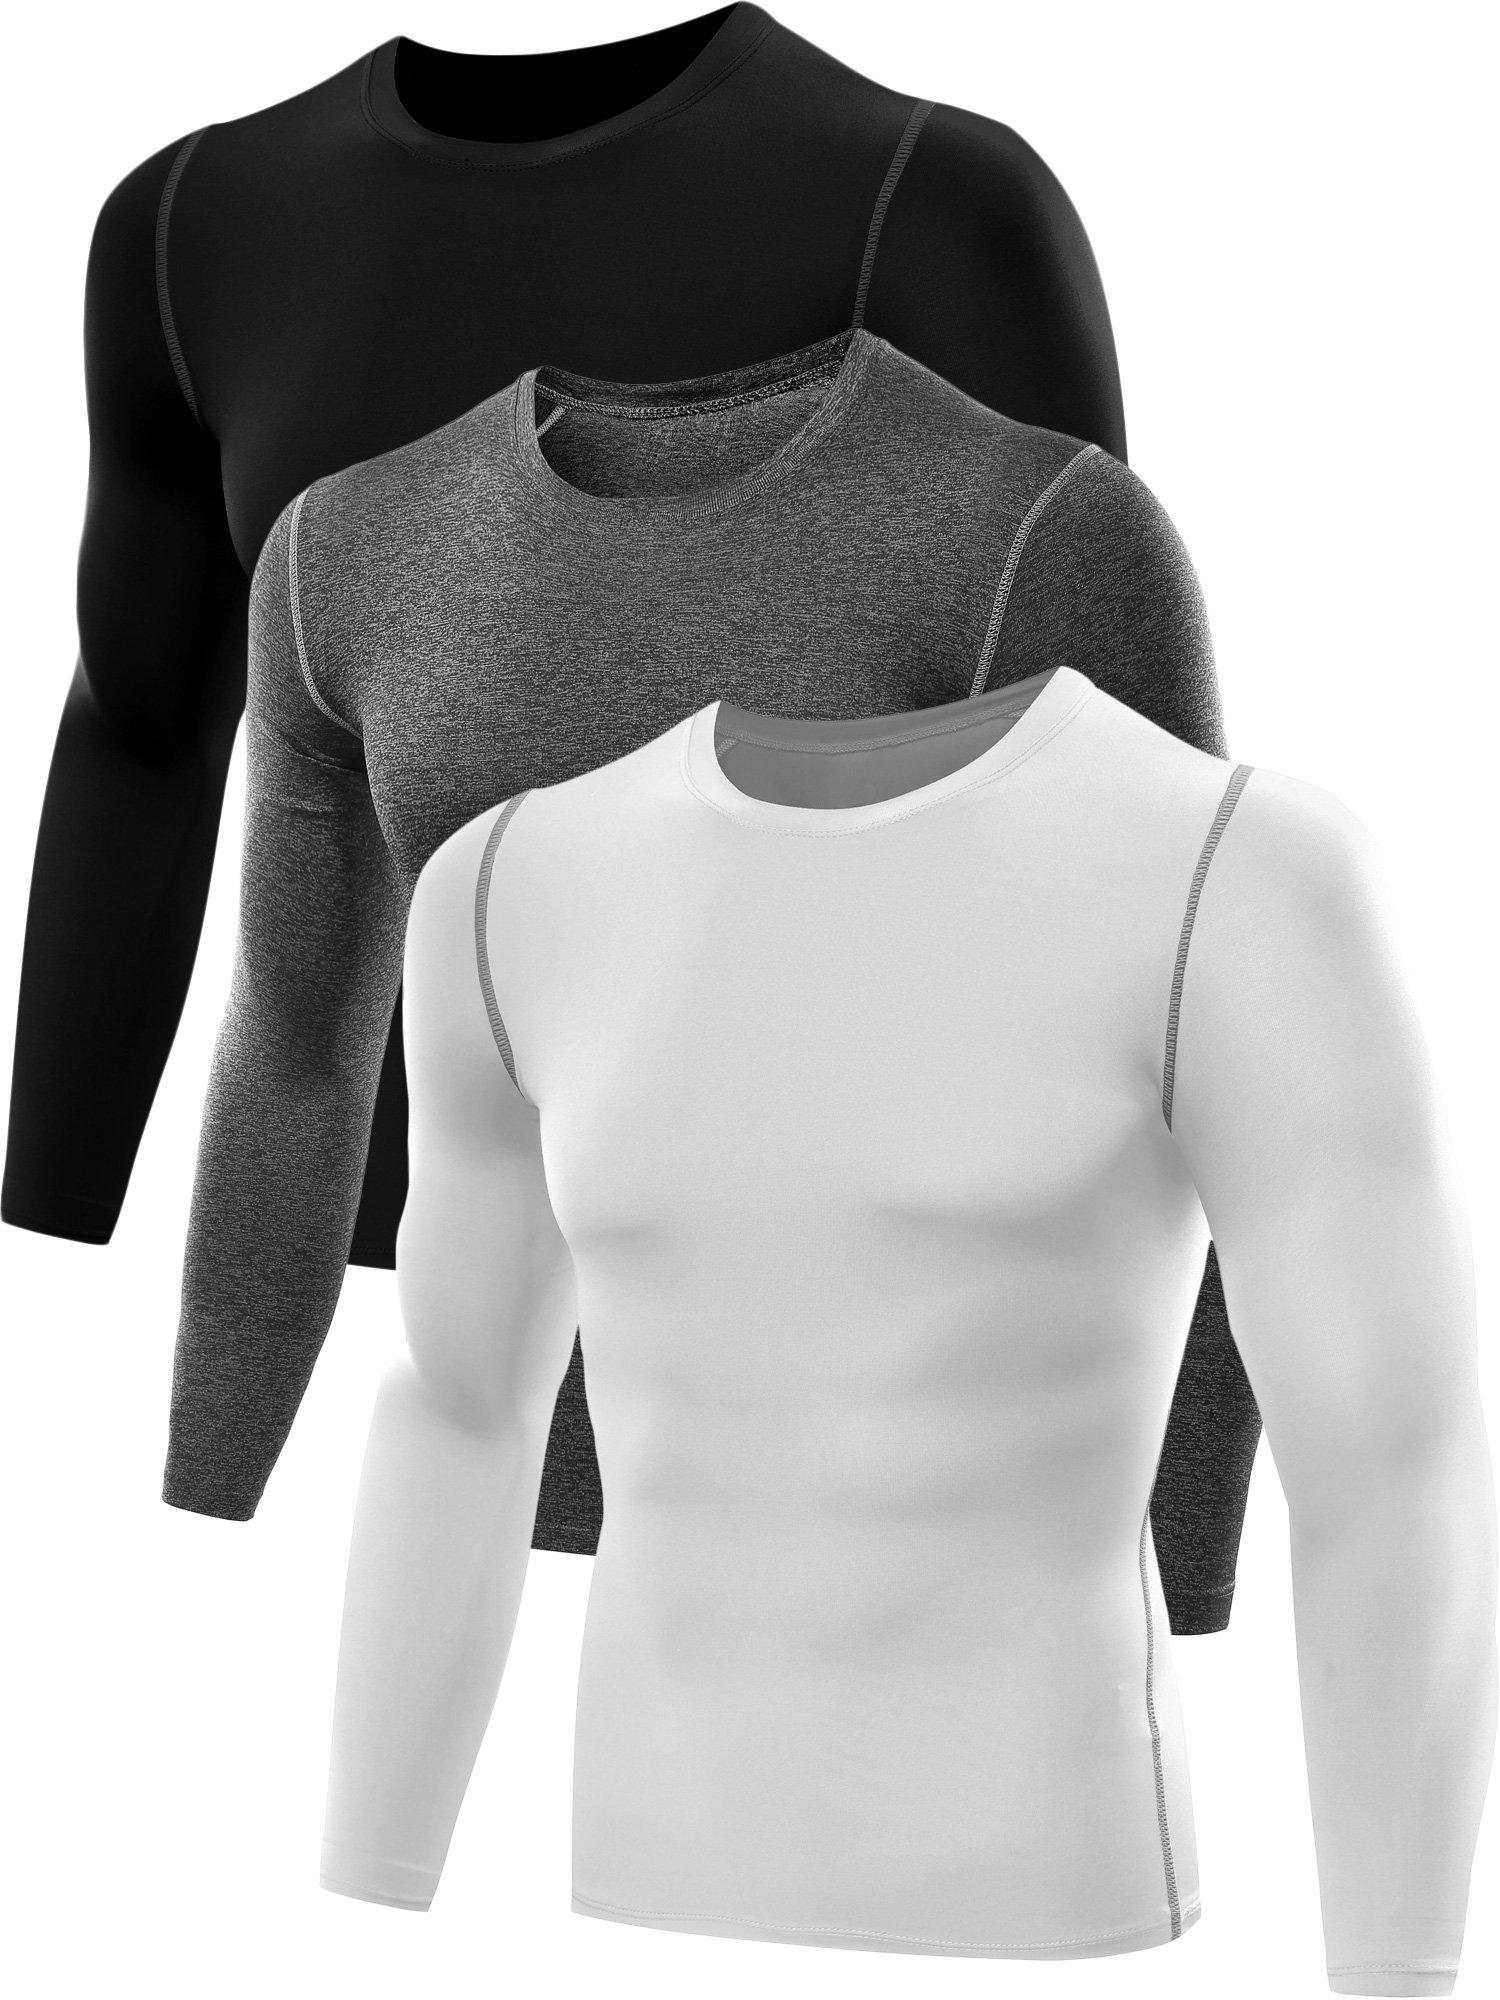 Neleus Men's 3 Pack Athletic Compression Sport Running T Shirt Long Sleeve Base Layer,Black,Grey,Whie,US S,EU M by Neleus